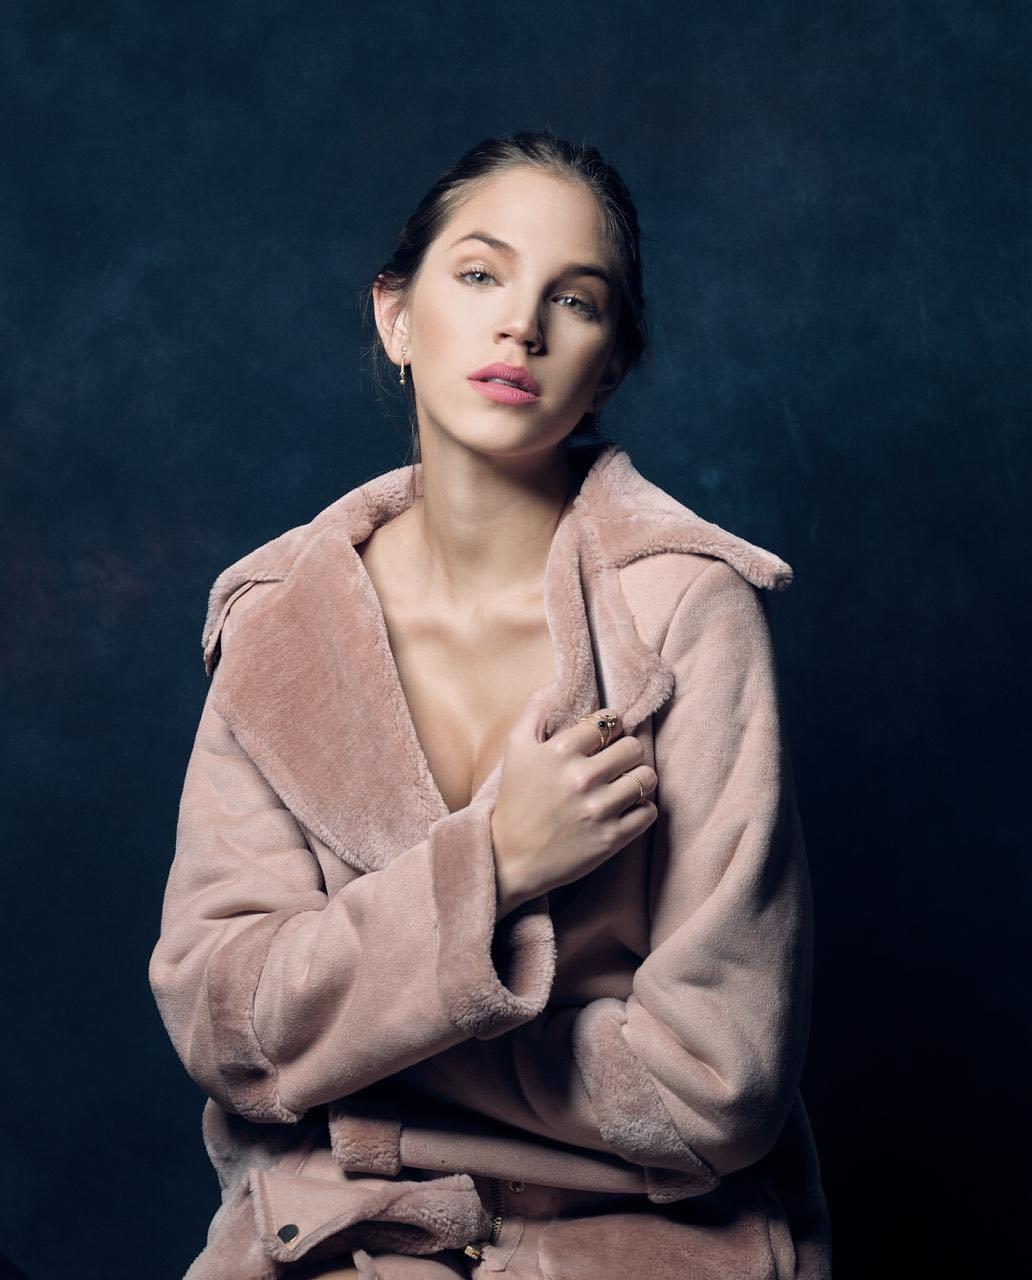 gina bitorzoli, miss intercontinental venezuela 2018-2019. - Página 2 89jxkf10